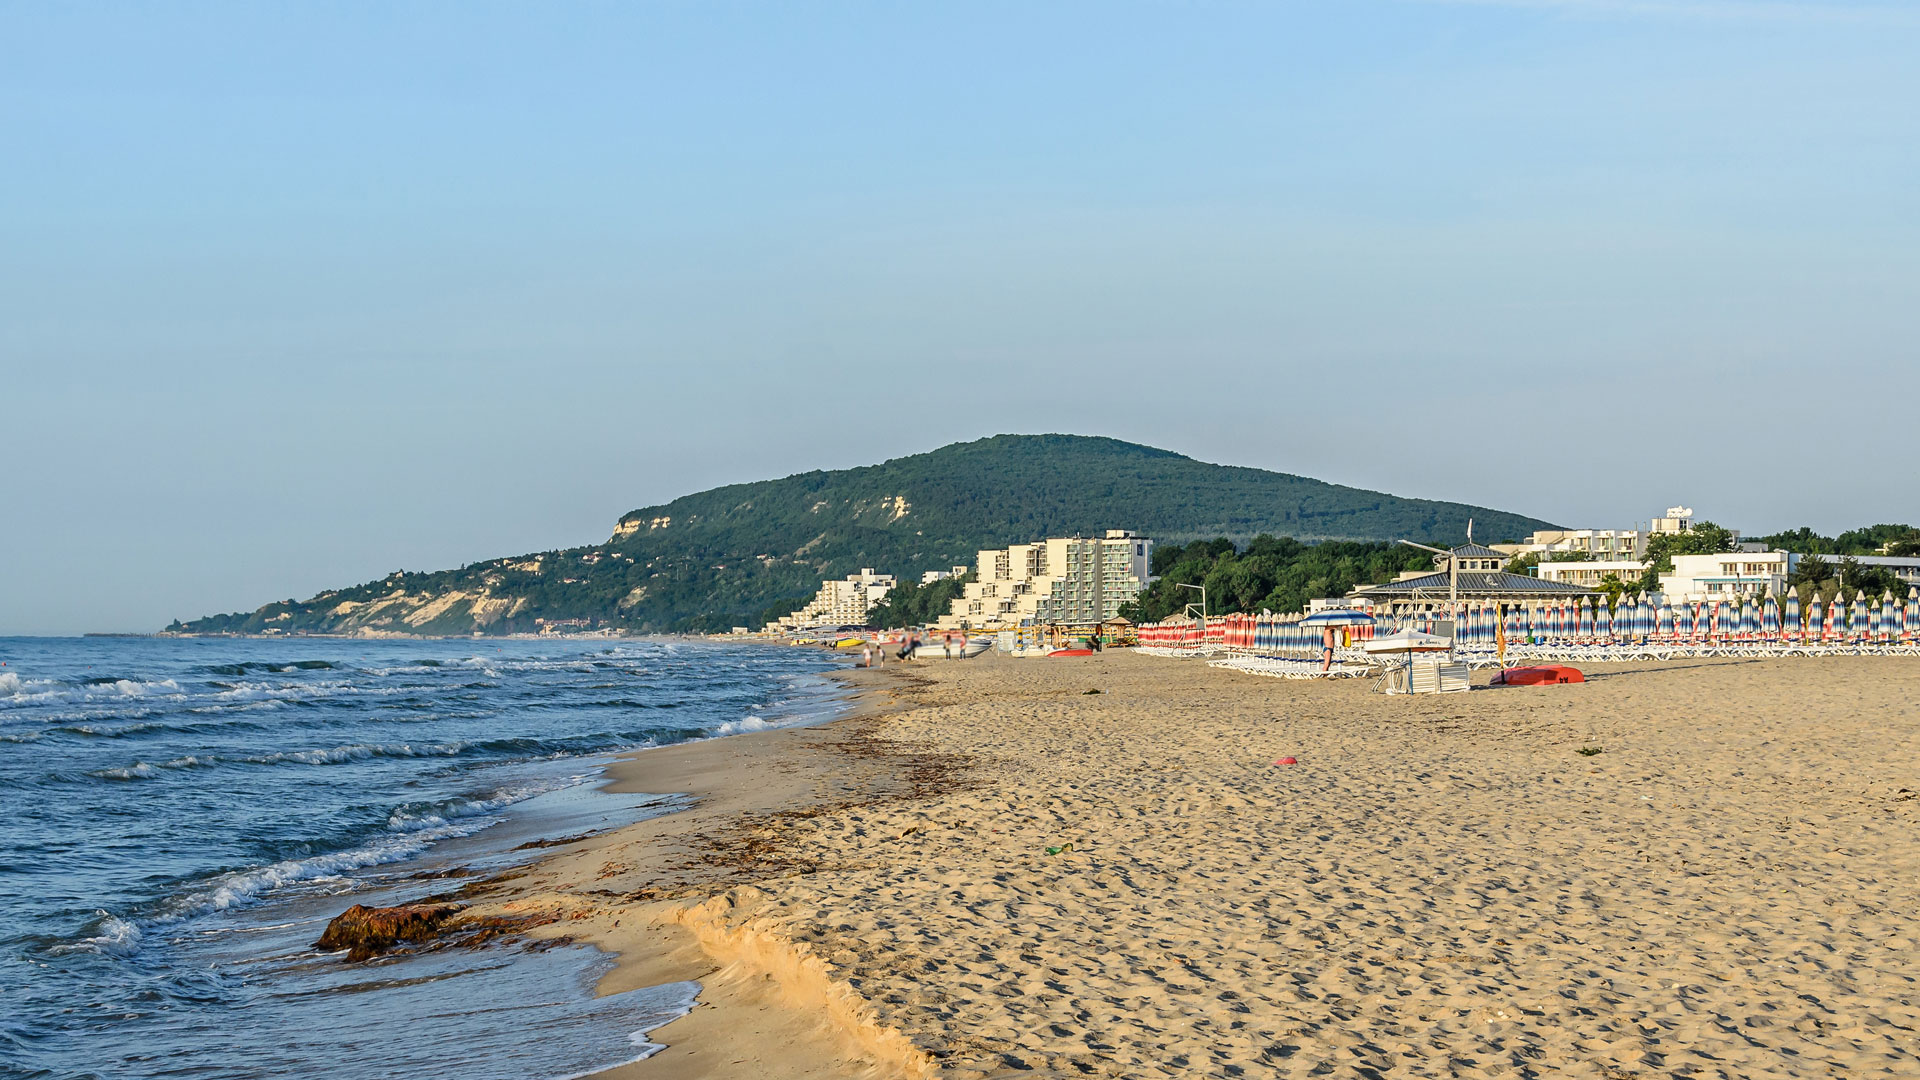 участок для инвестиции в Болгарии